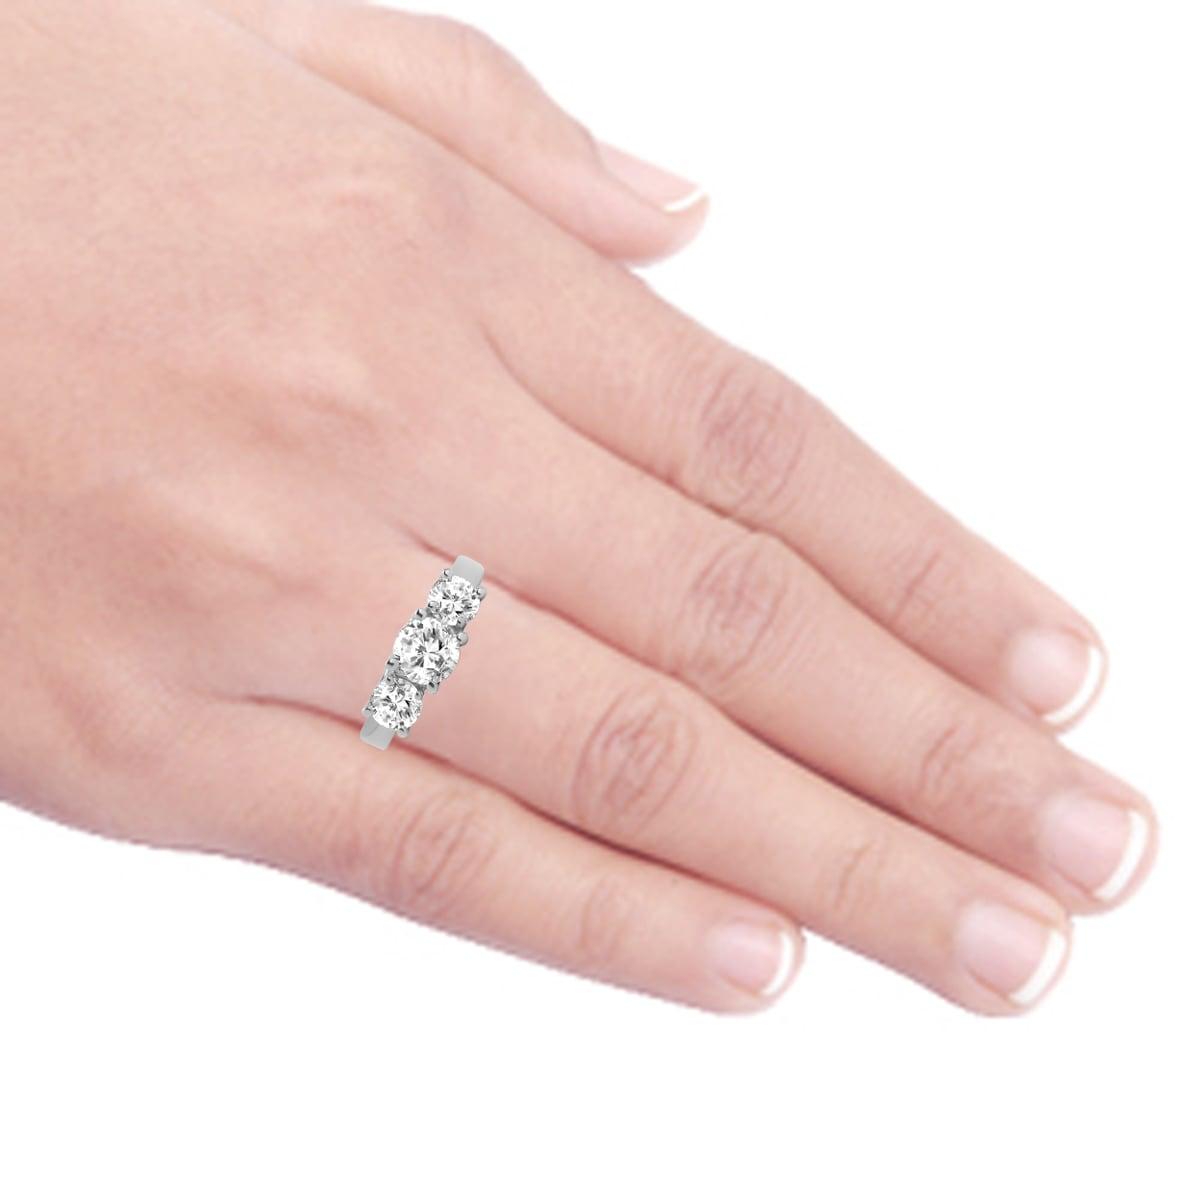 Shop Divina 14k White Gold 1ct TDW 3-stone Diamond Anniversary Ring ...